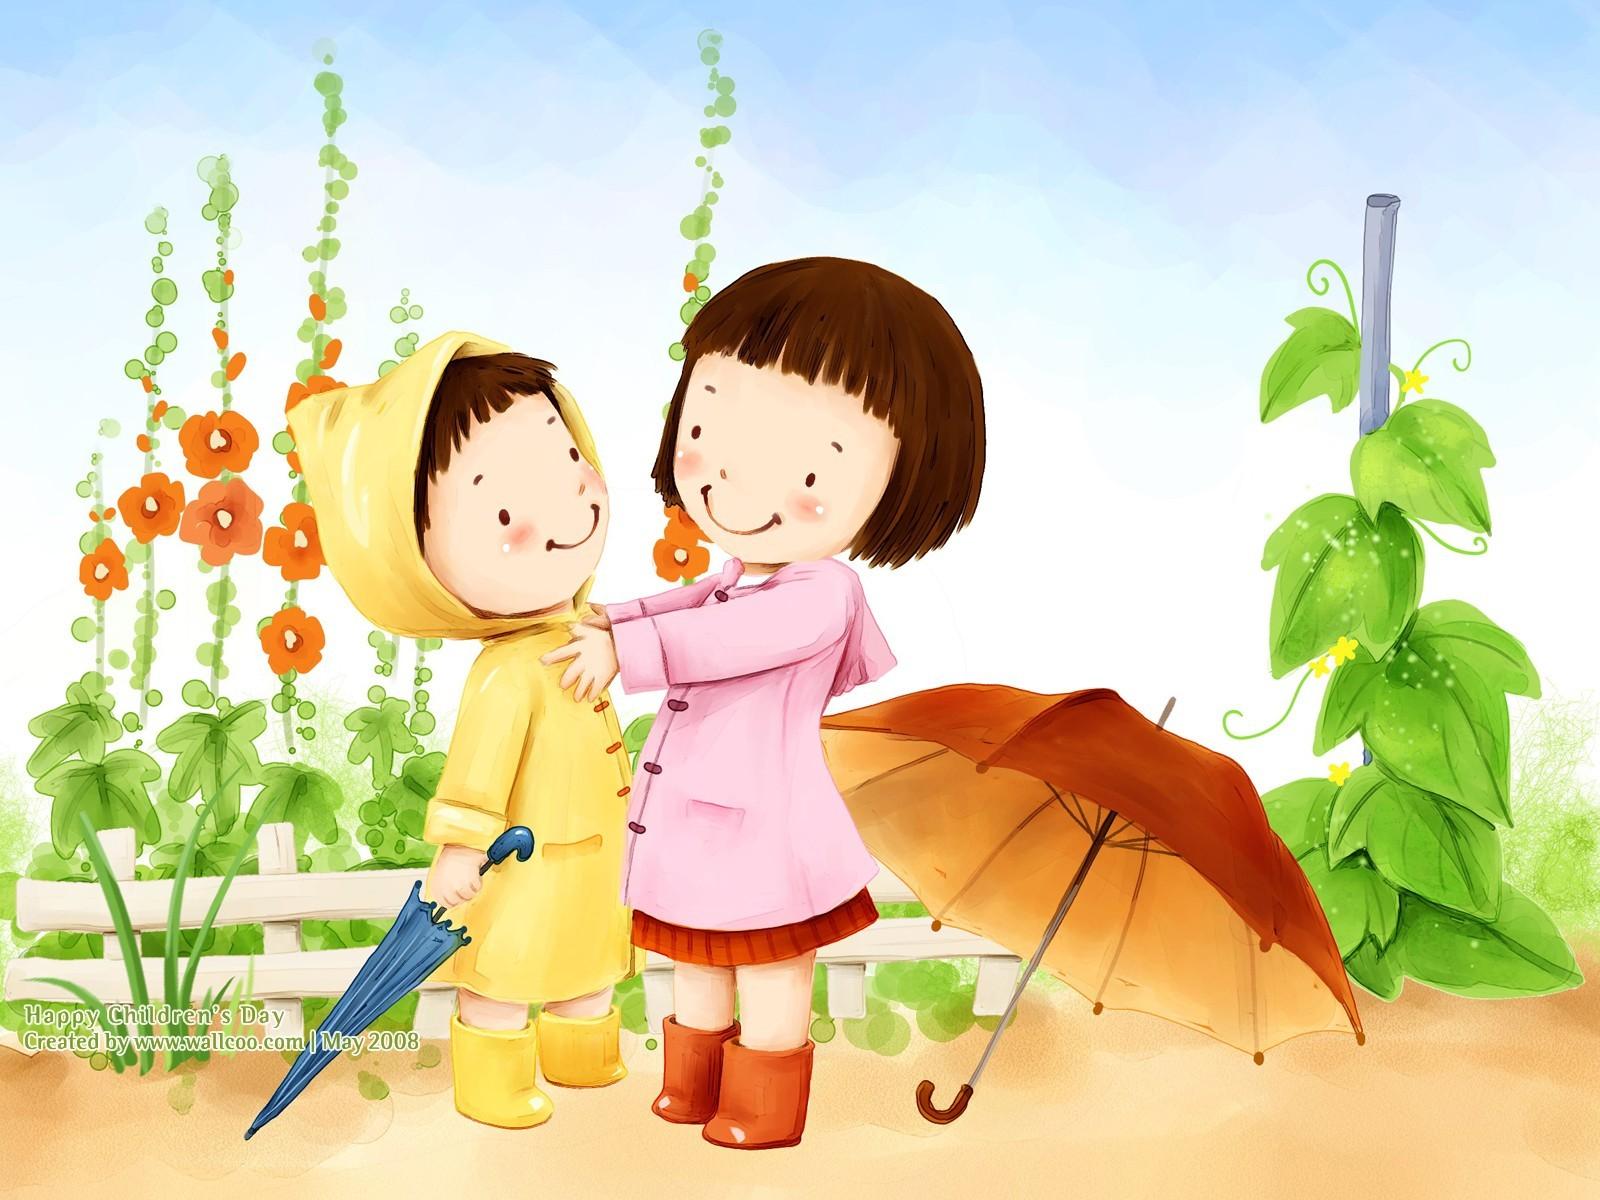 childrens day art wallpaper -#main